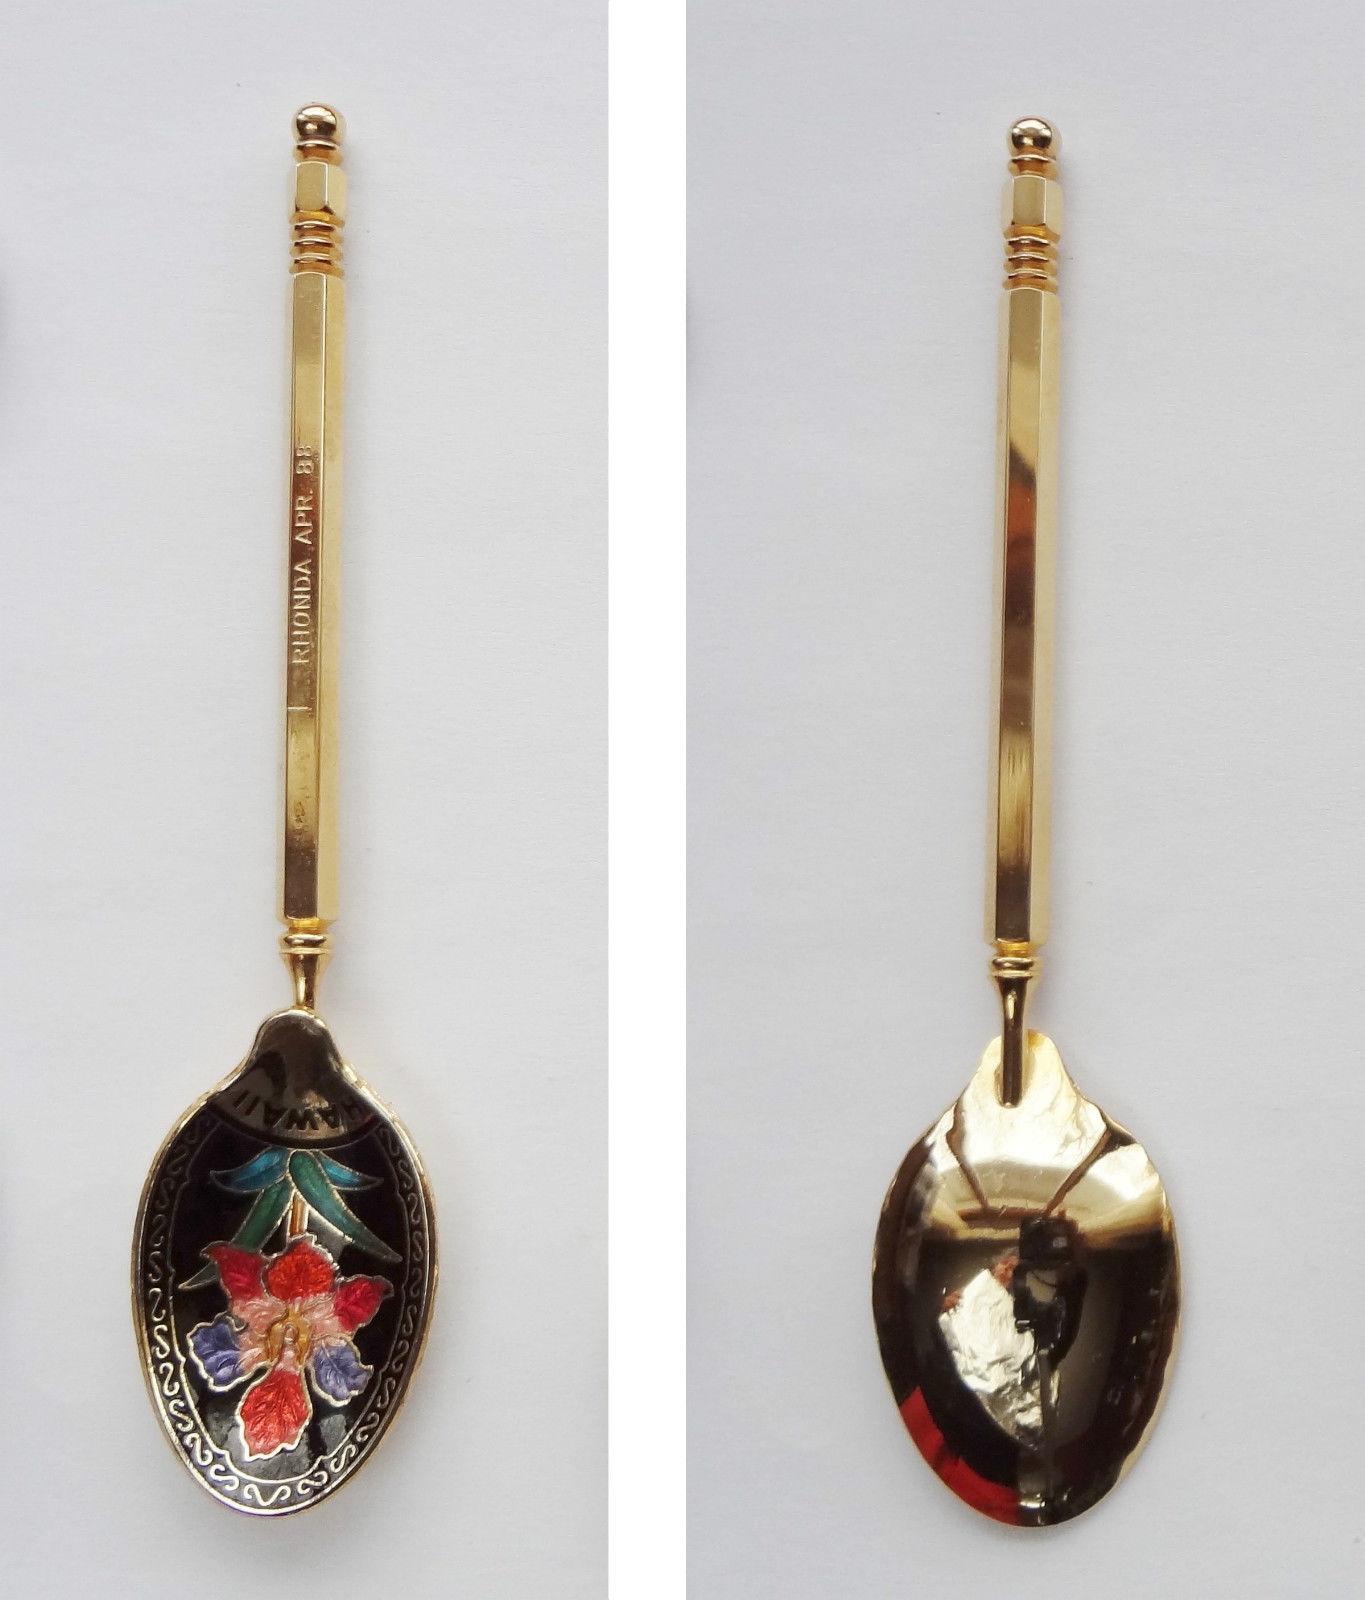 Collector Souvenir Spoon USA Hawaii Hibiscus Cloisonne Bowl Rhonda April 88